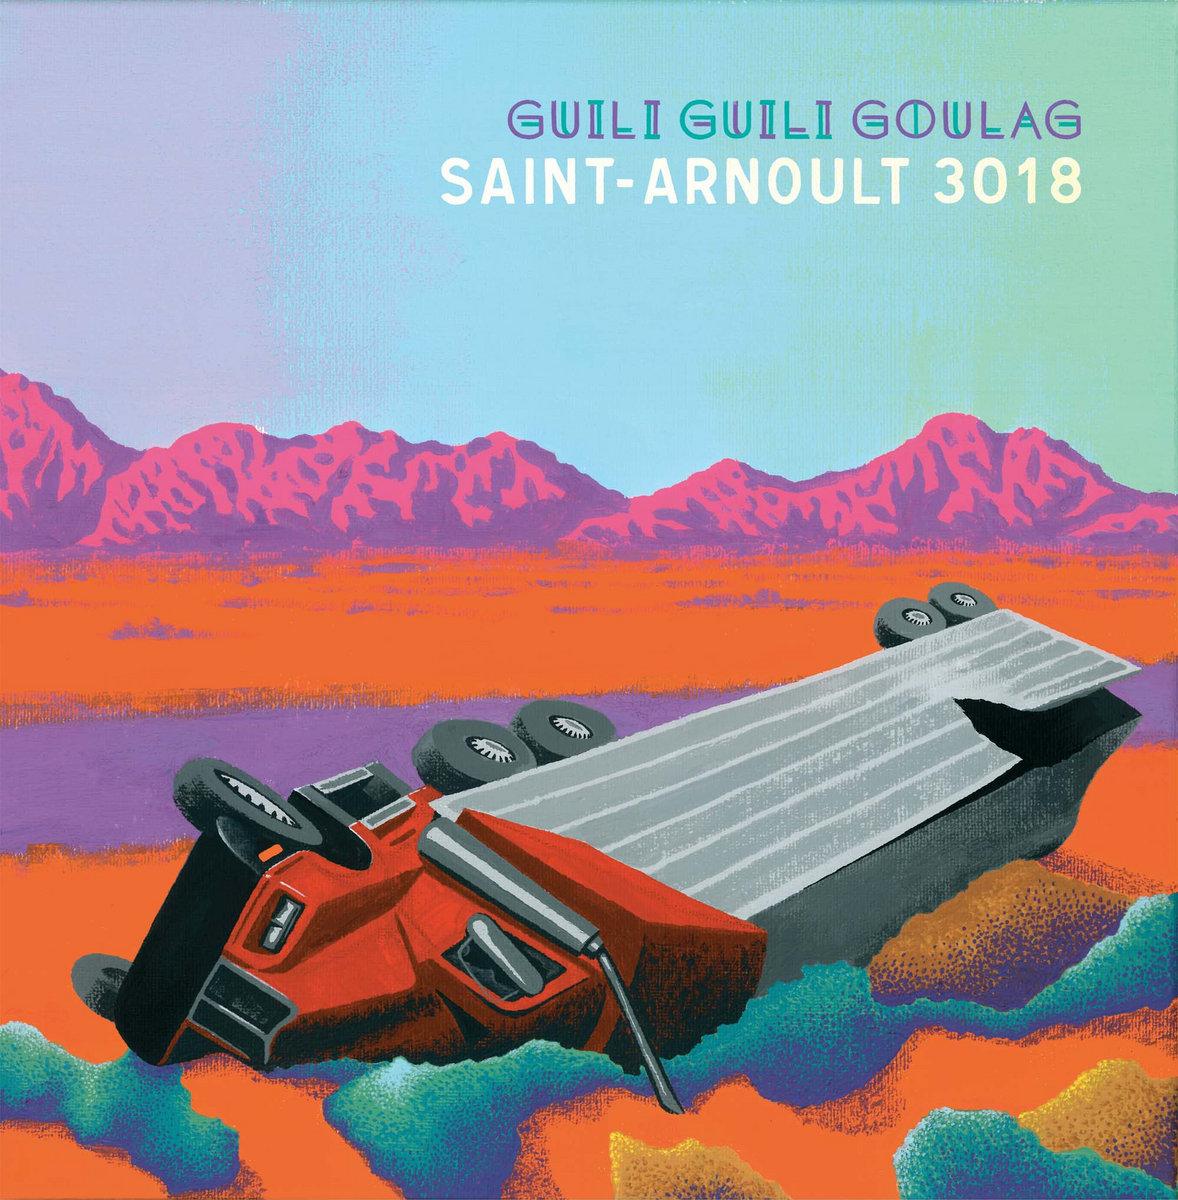 Guili Guili Goulag - Saint Arnoult 3018